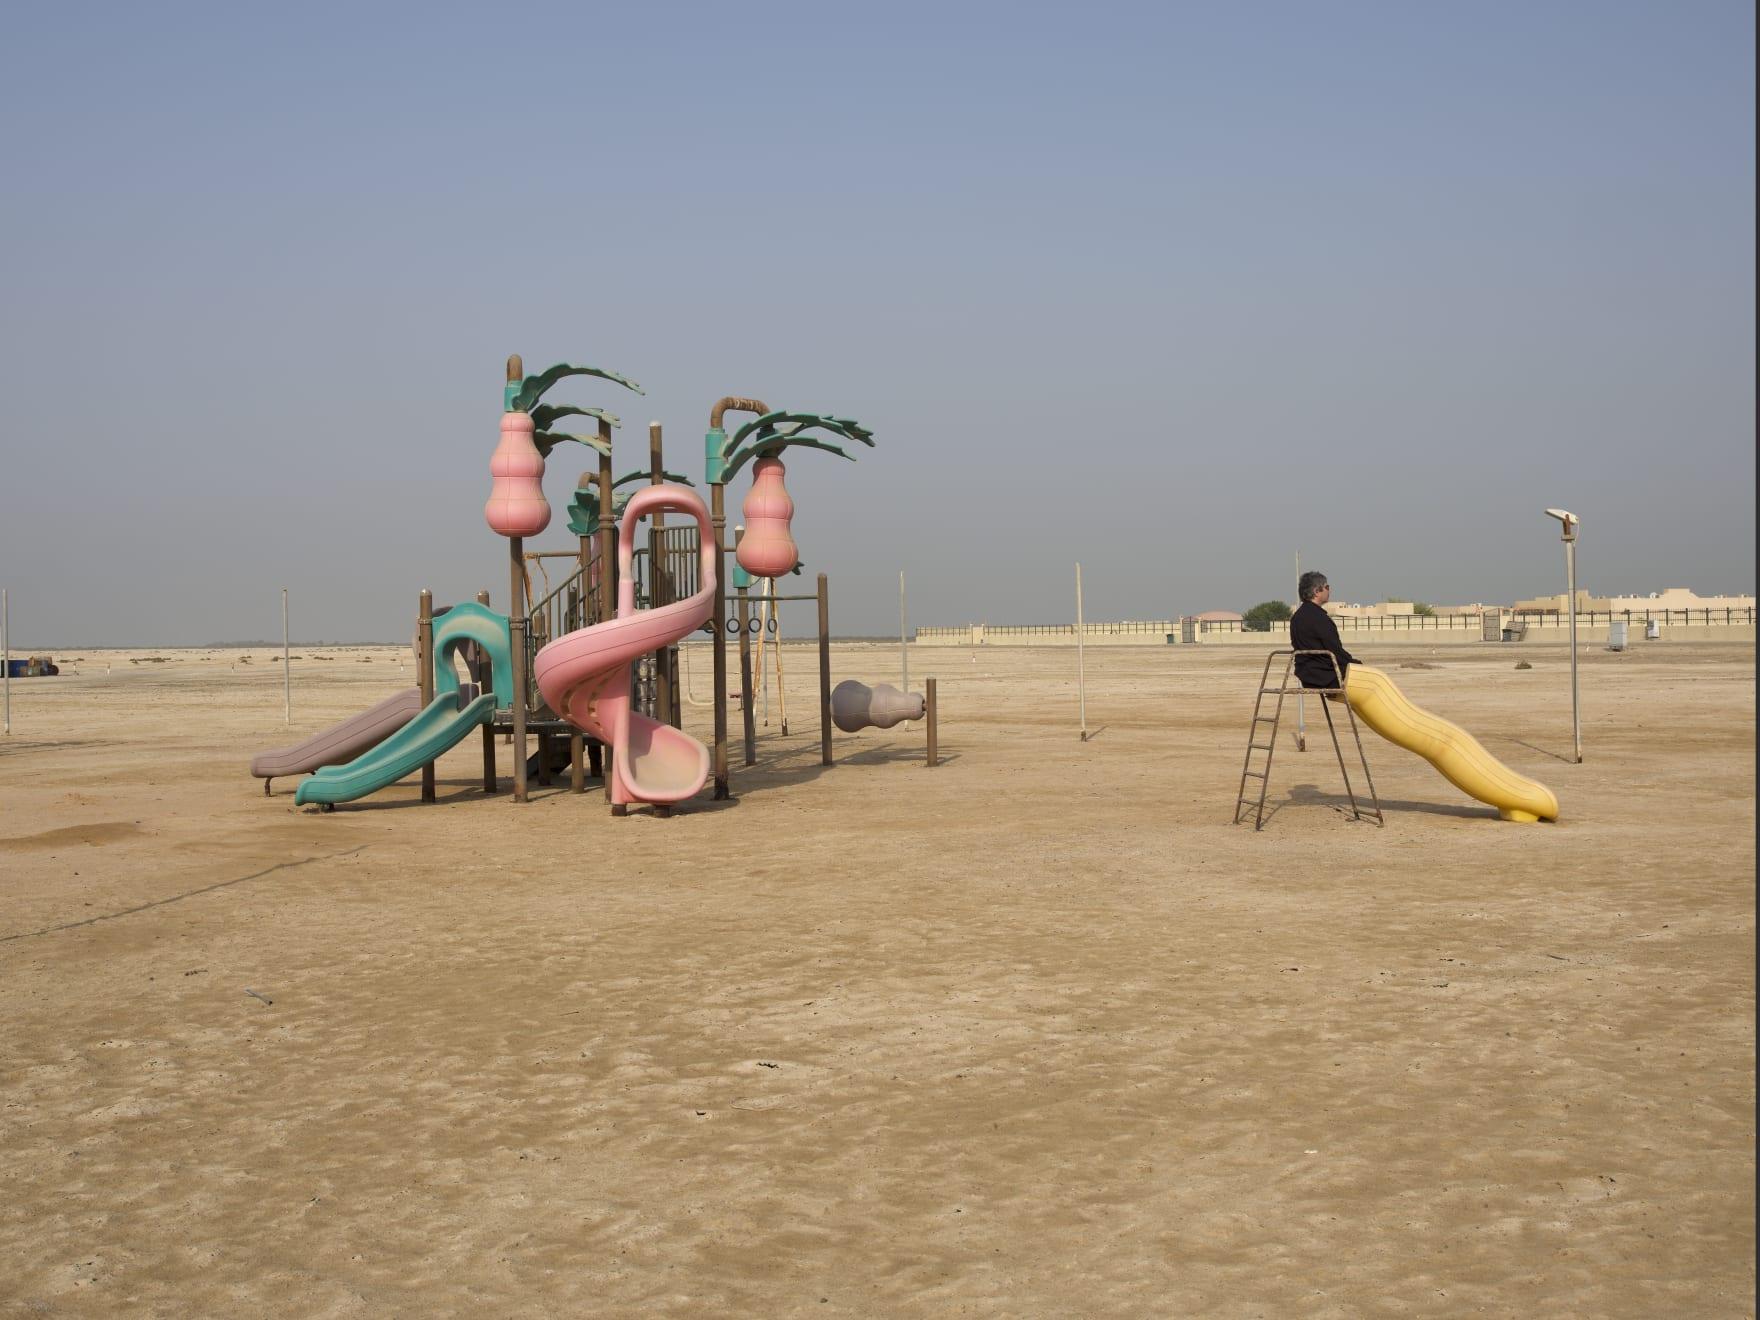 Tarek Al-Ghoussein, Abu Dhabi Archipelago (Ramhan), 2015-, Digital Print, 60 x 80cm, Edition of 6 + 1AP USD 8,000 (Excluding VAT)